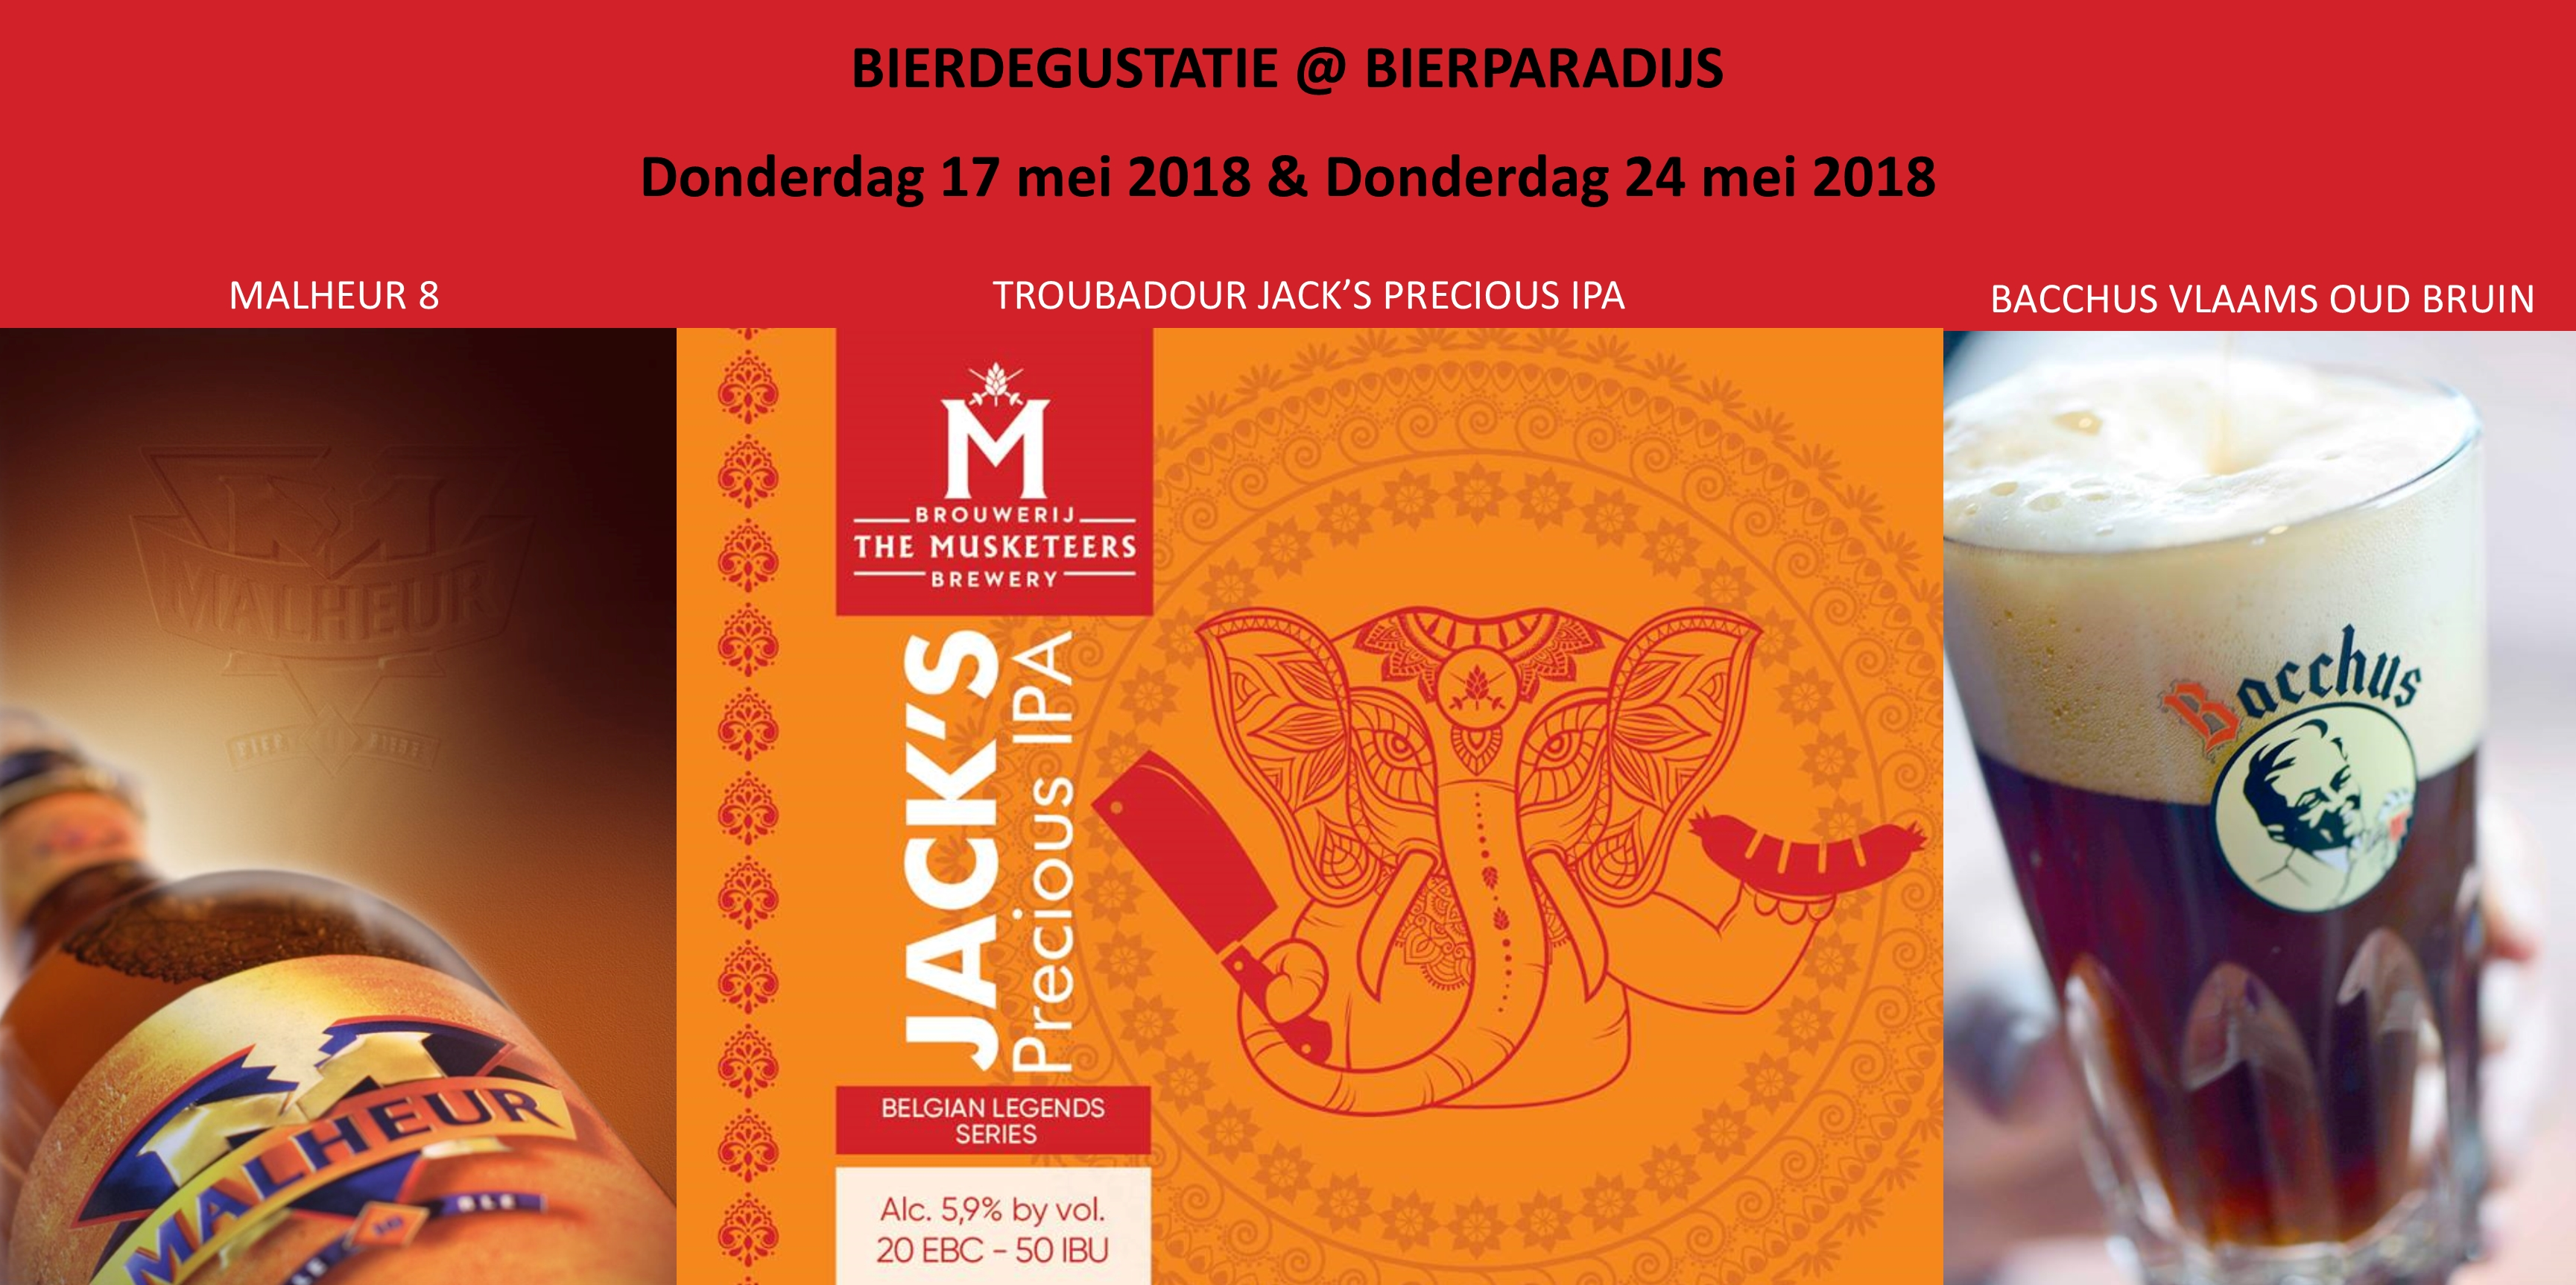 Degustatie Malheur, Troubadour & Bacchus - Bierparadijs